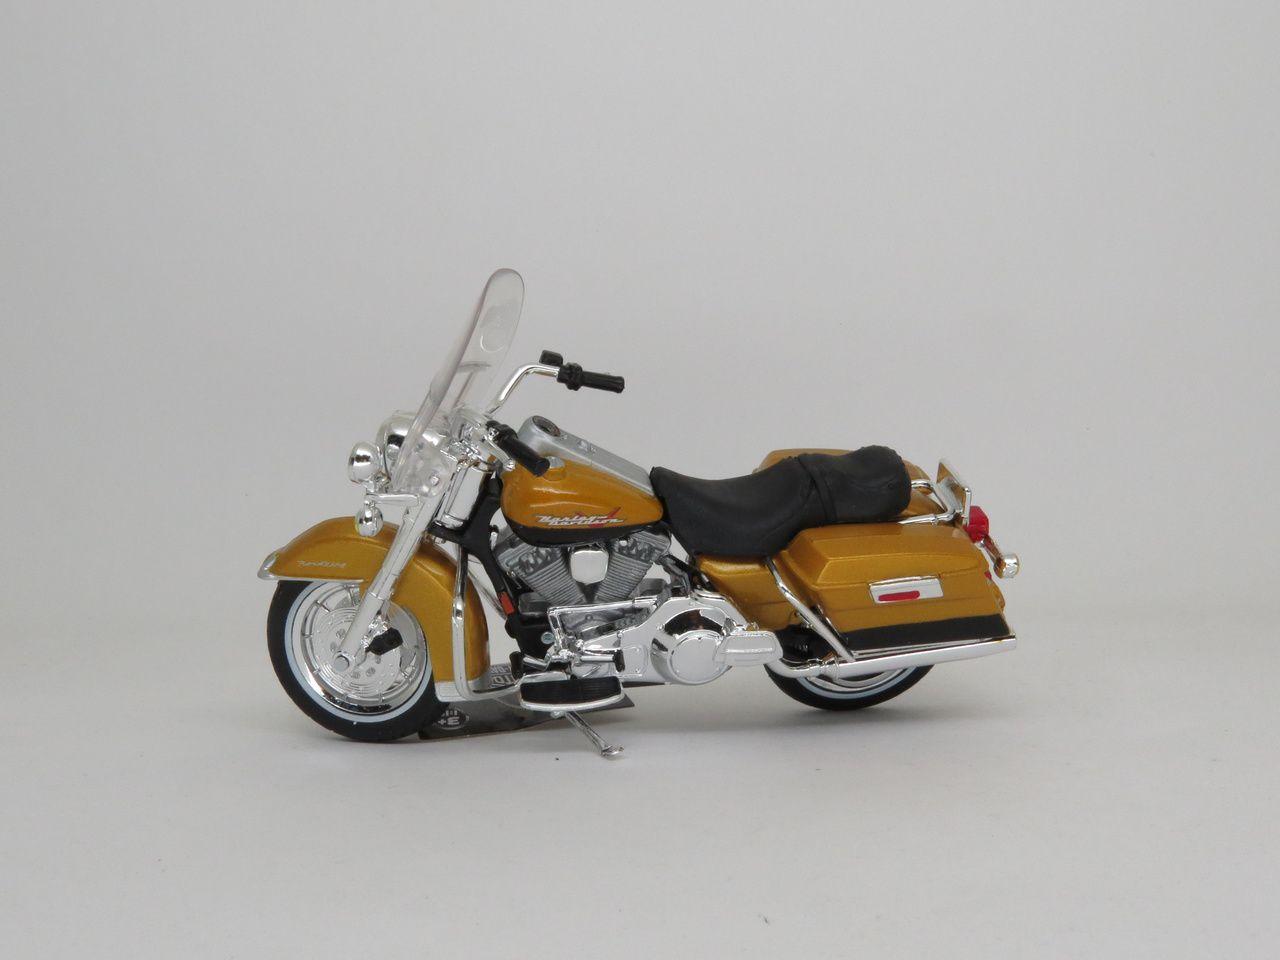 Harley Davidson Road King 1999 Wgt Store